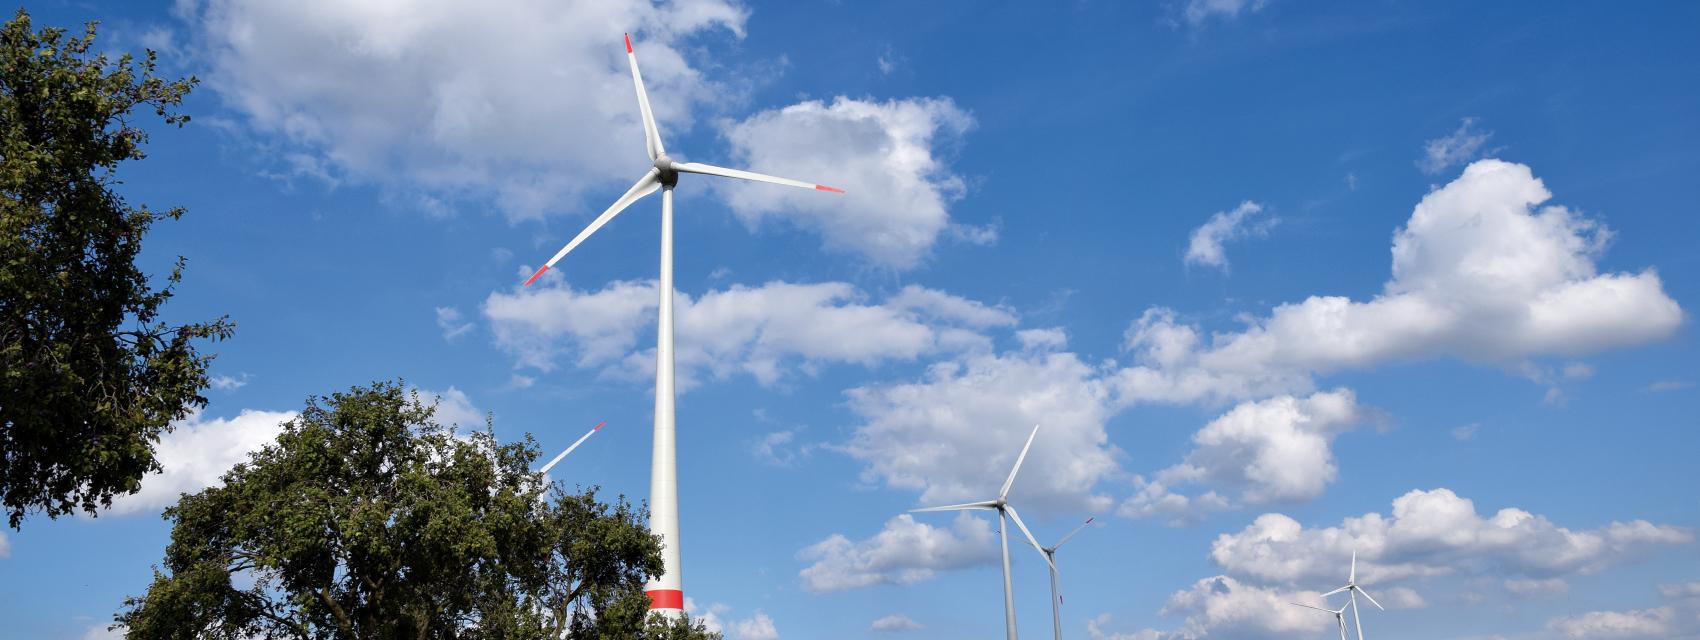 Windkraftanlagen Rahden